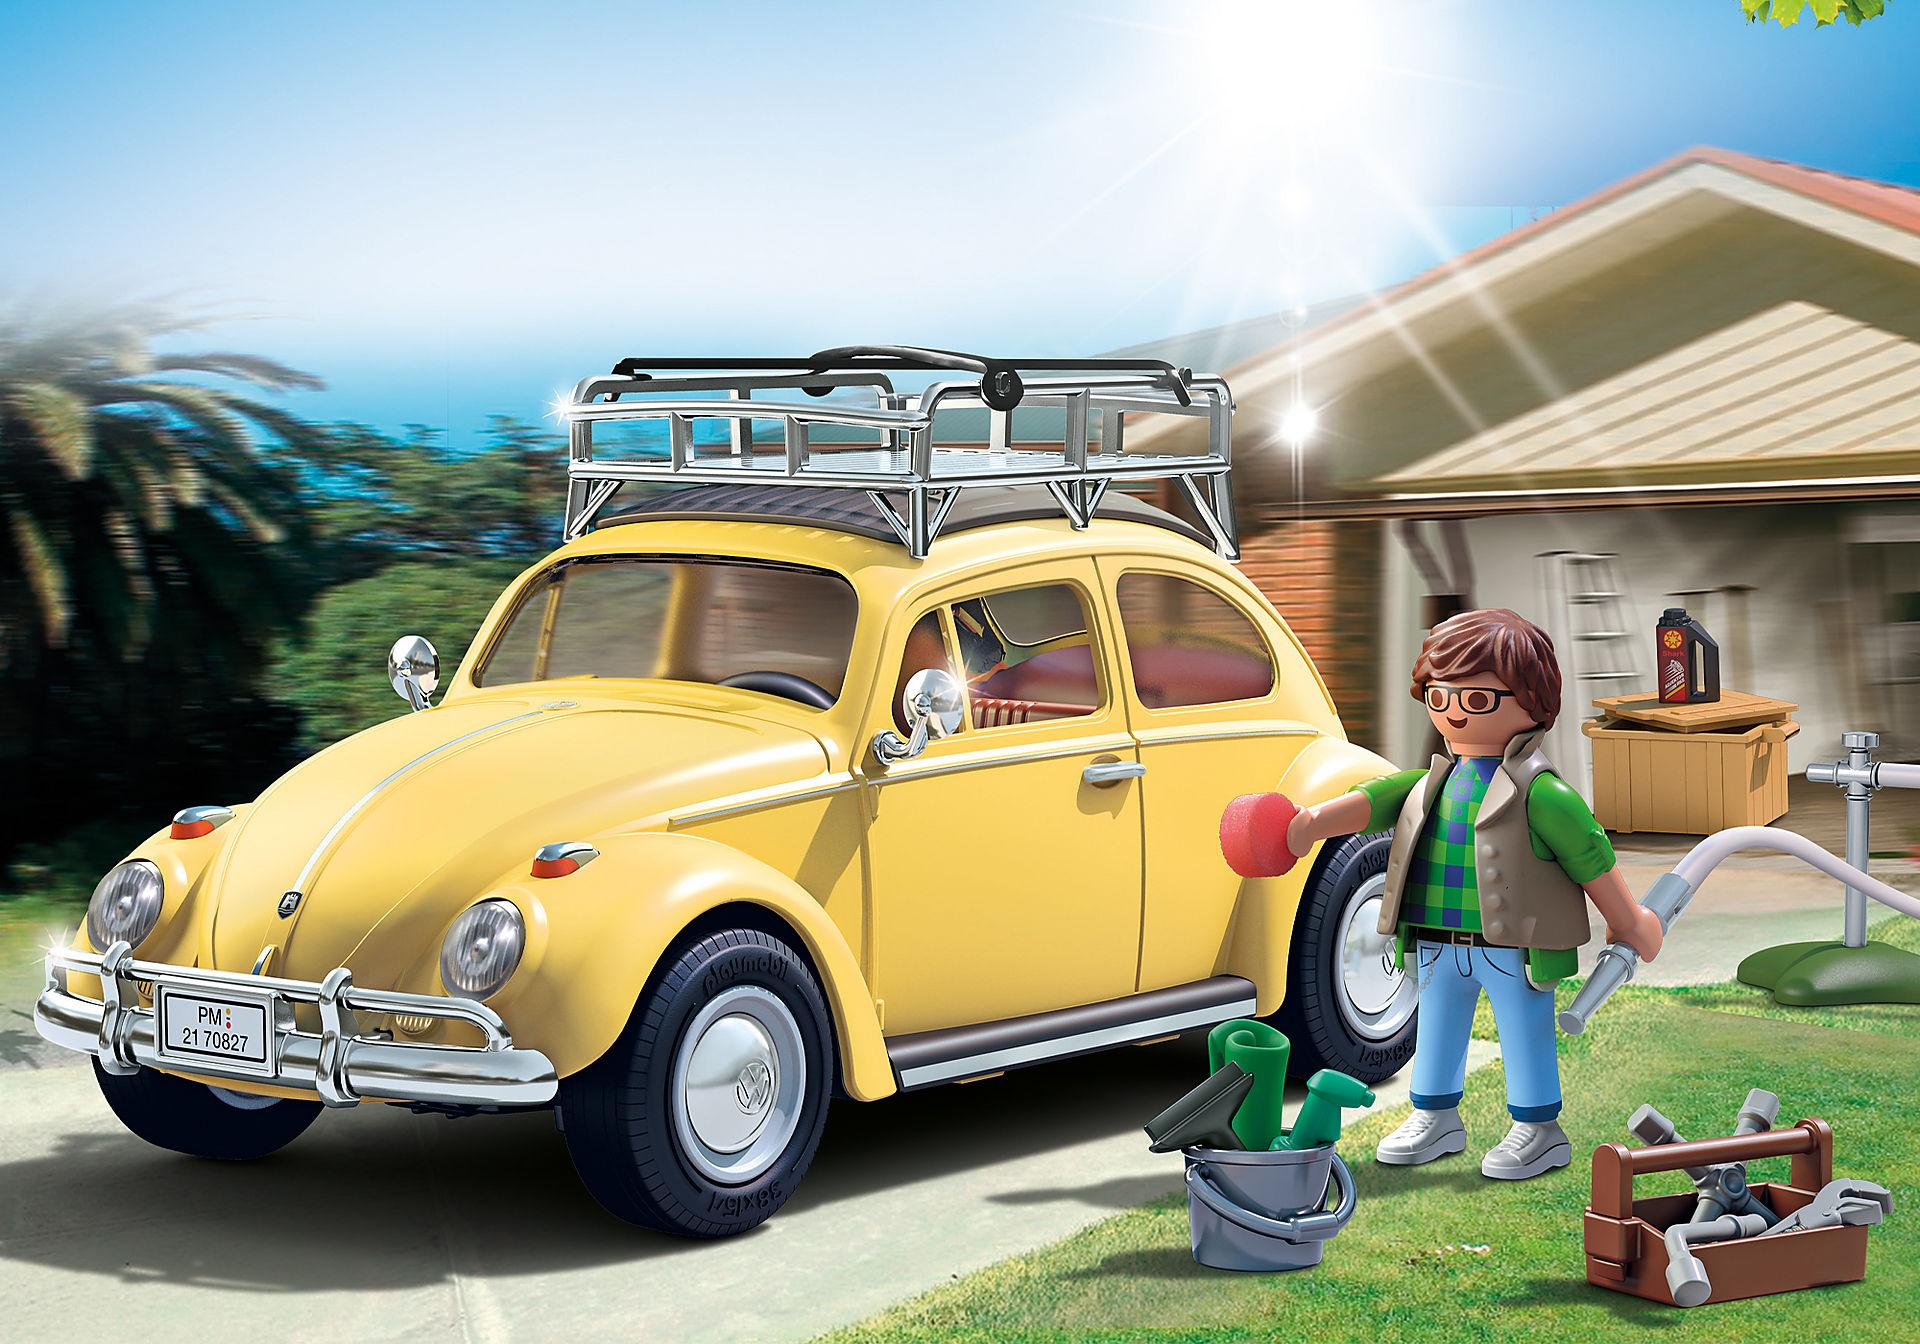 70827 Volkswagen Beetle - Edição especial zoom image8